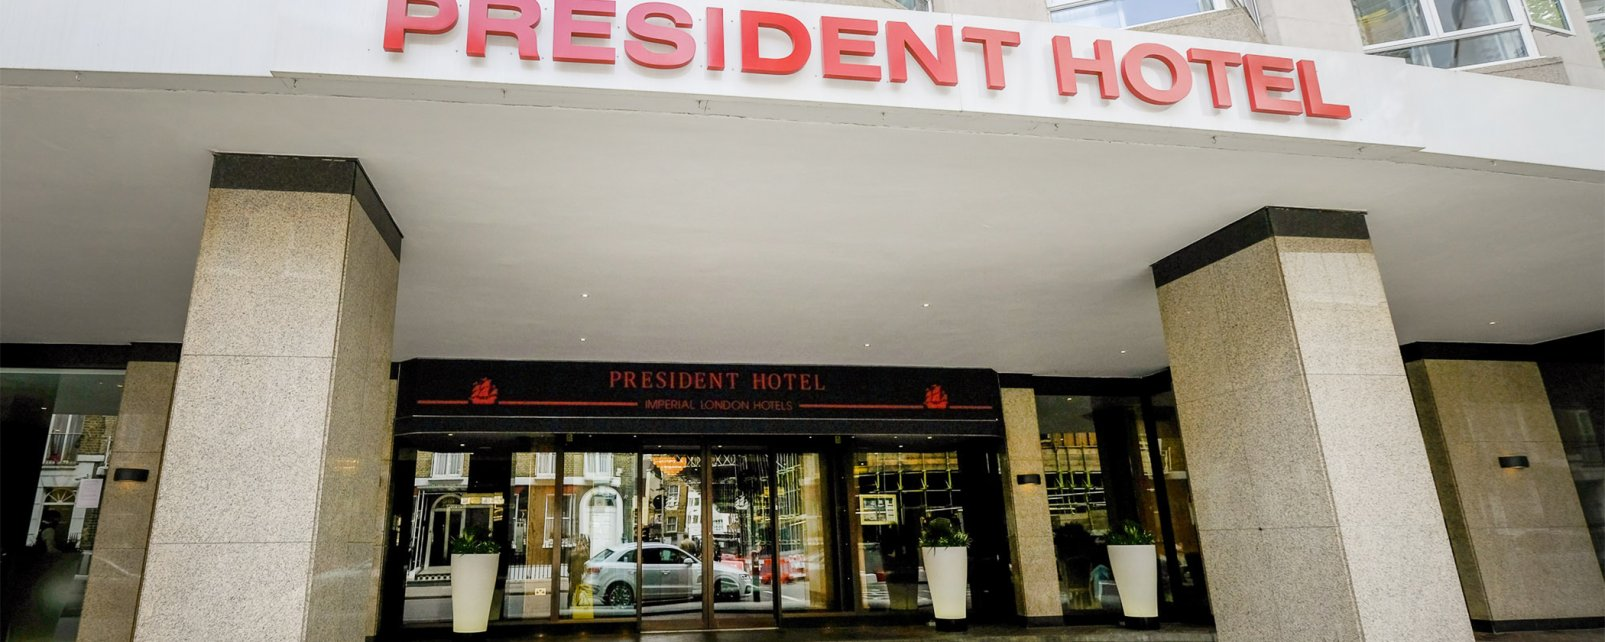 President Hotel London Bewertung